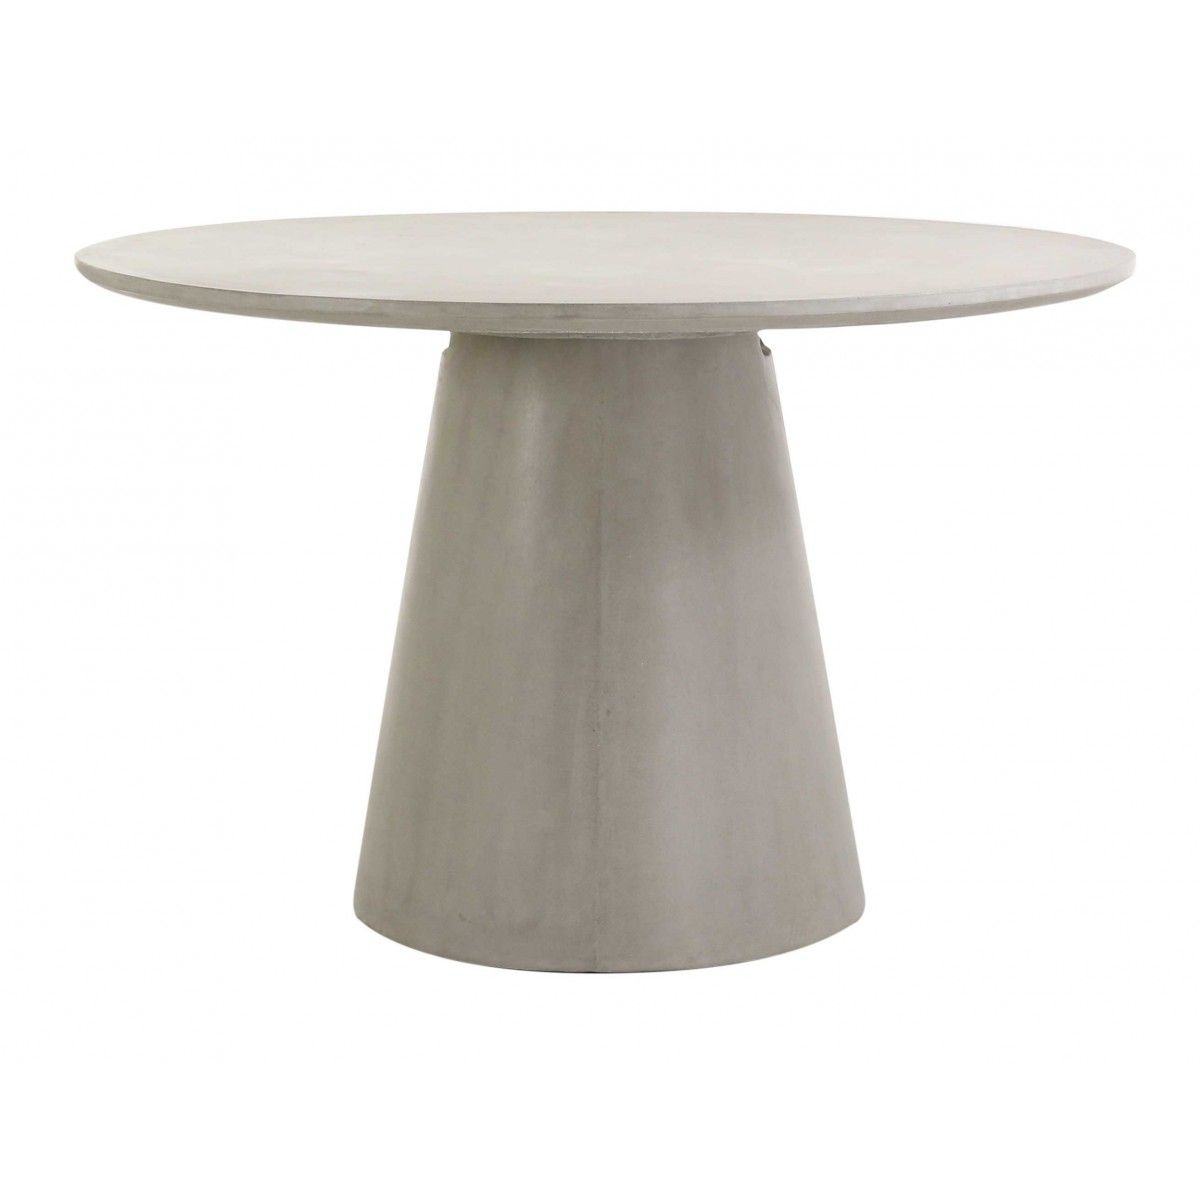 Table Beton Cire à table béton ronde, table beton cire, table béton design, table